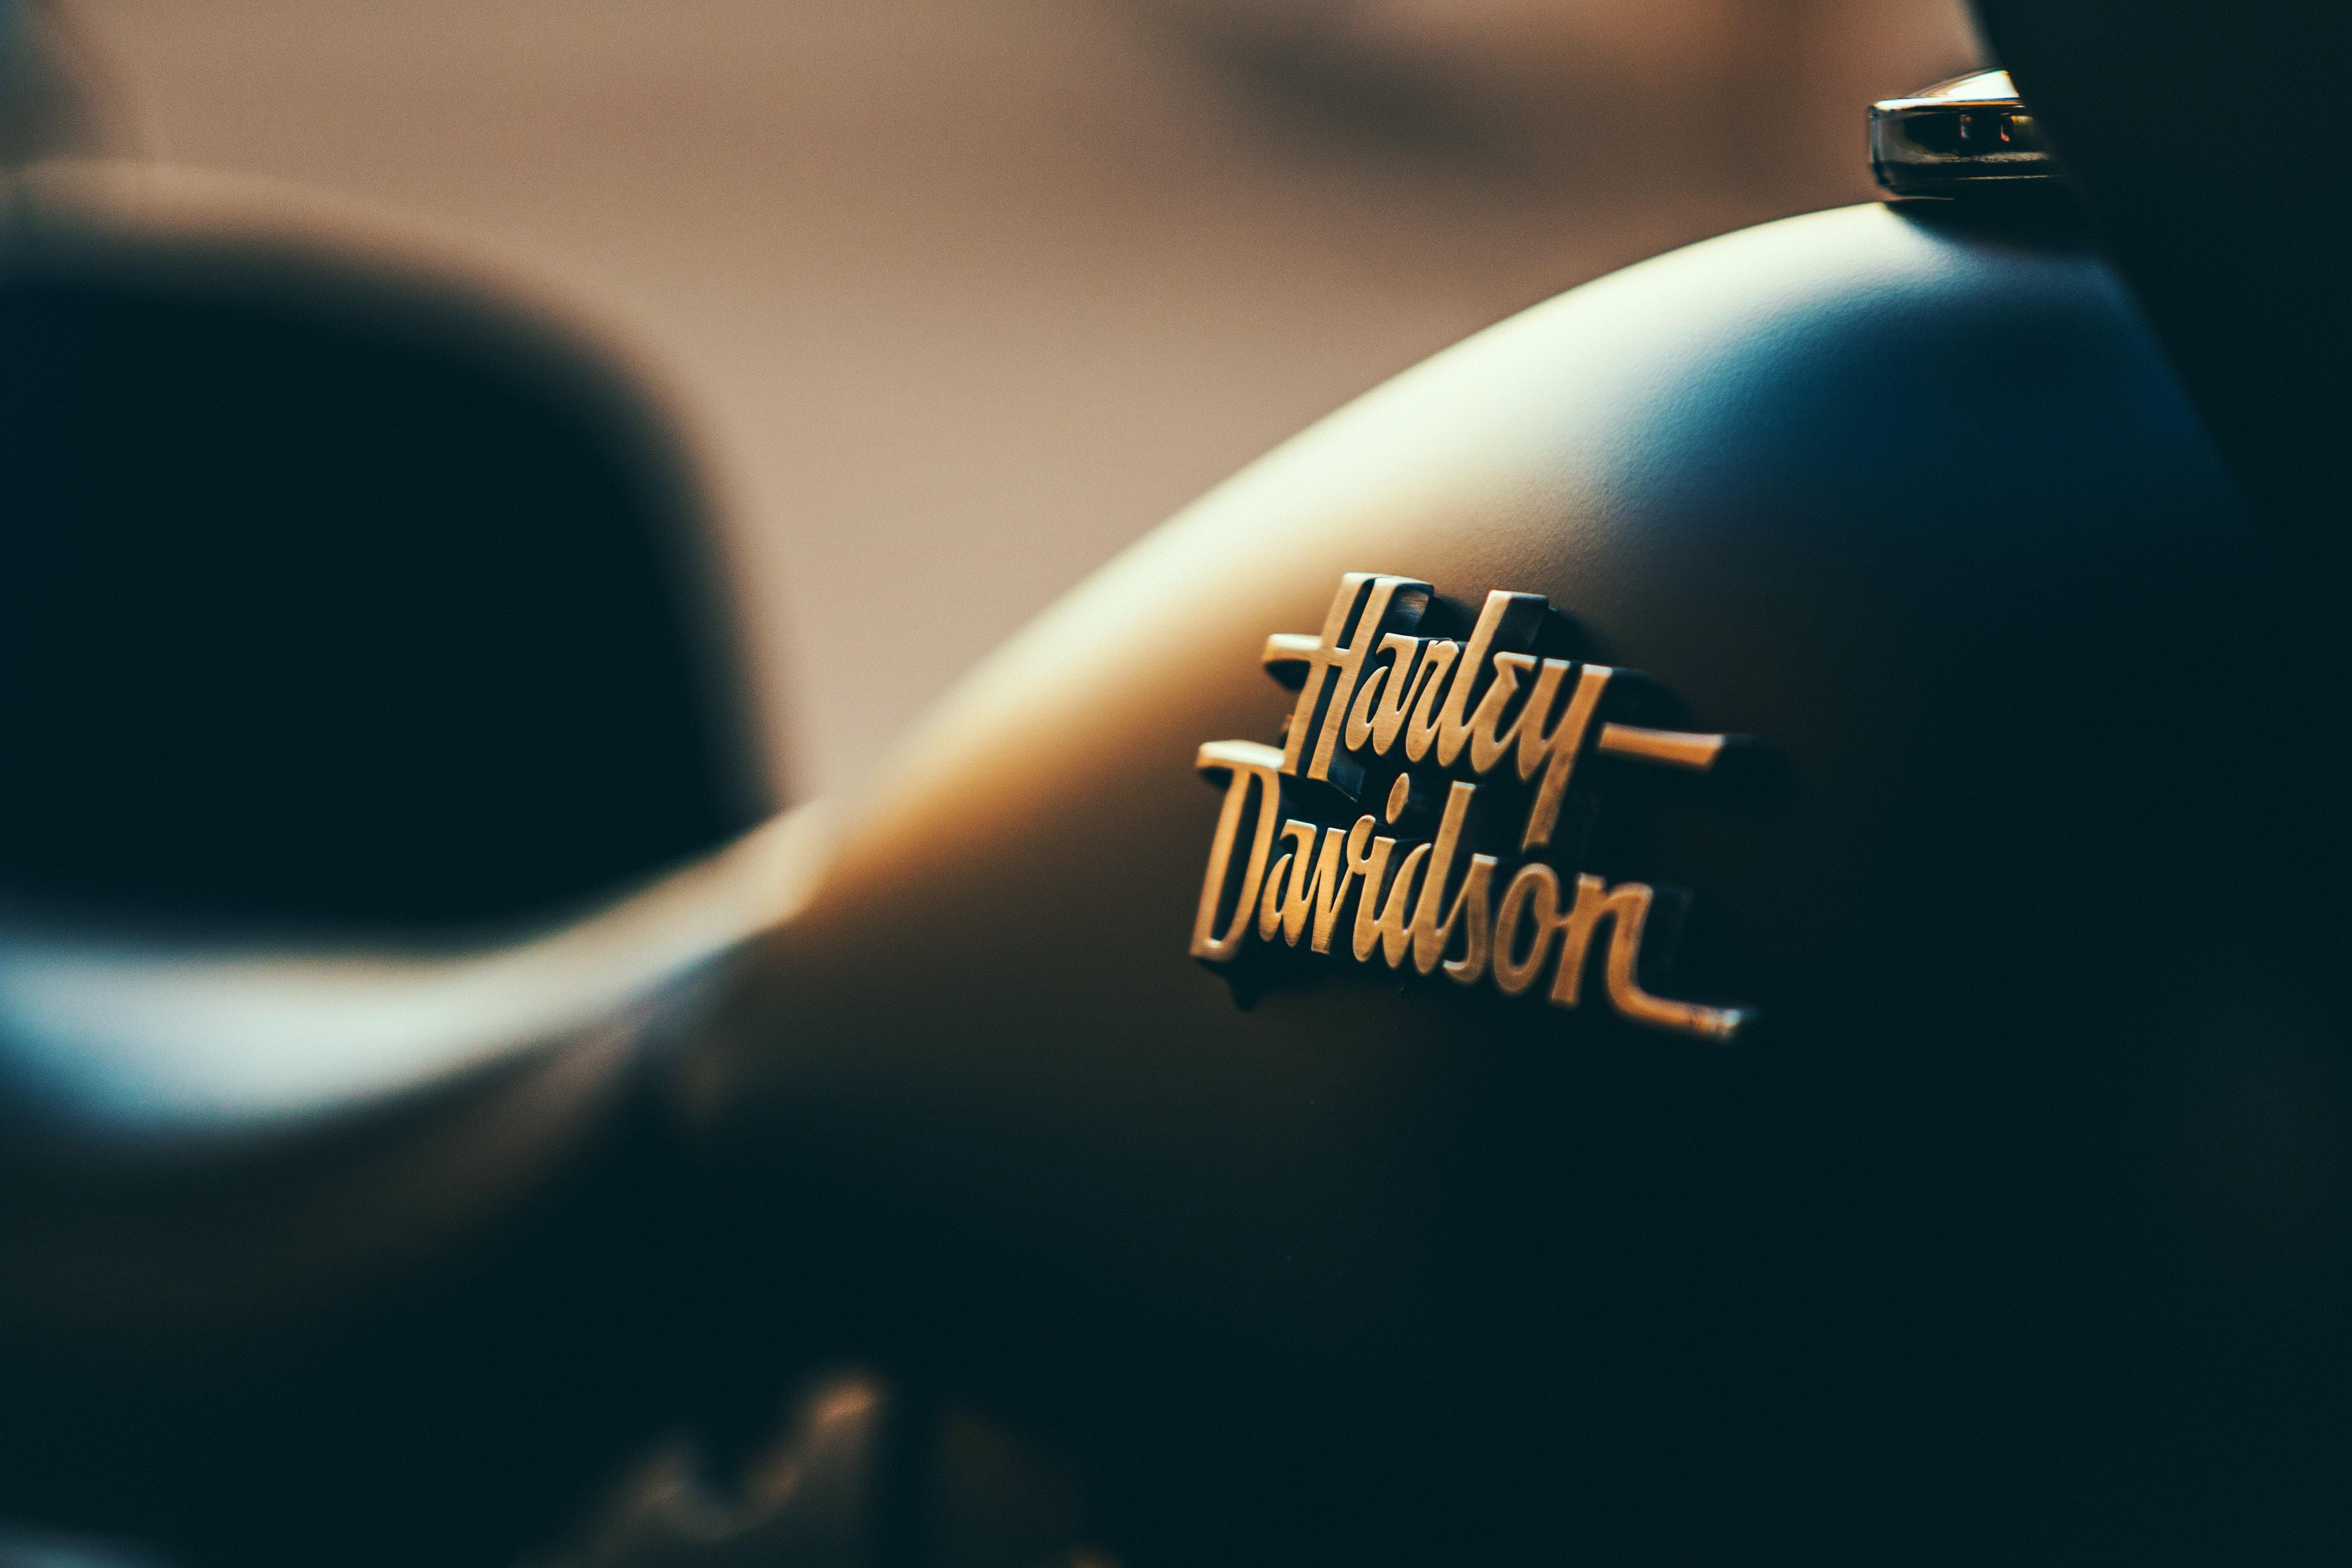 Black Harley Davidson Motorcycle Fuel Tank